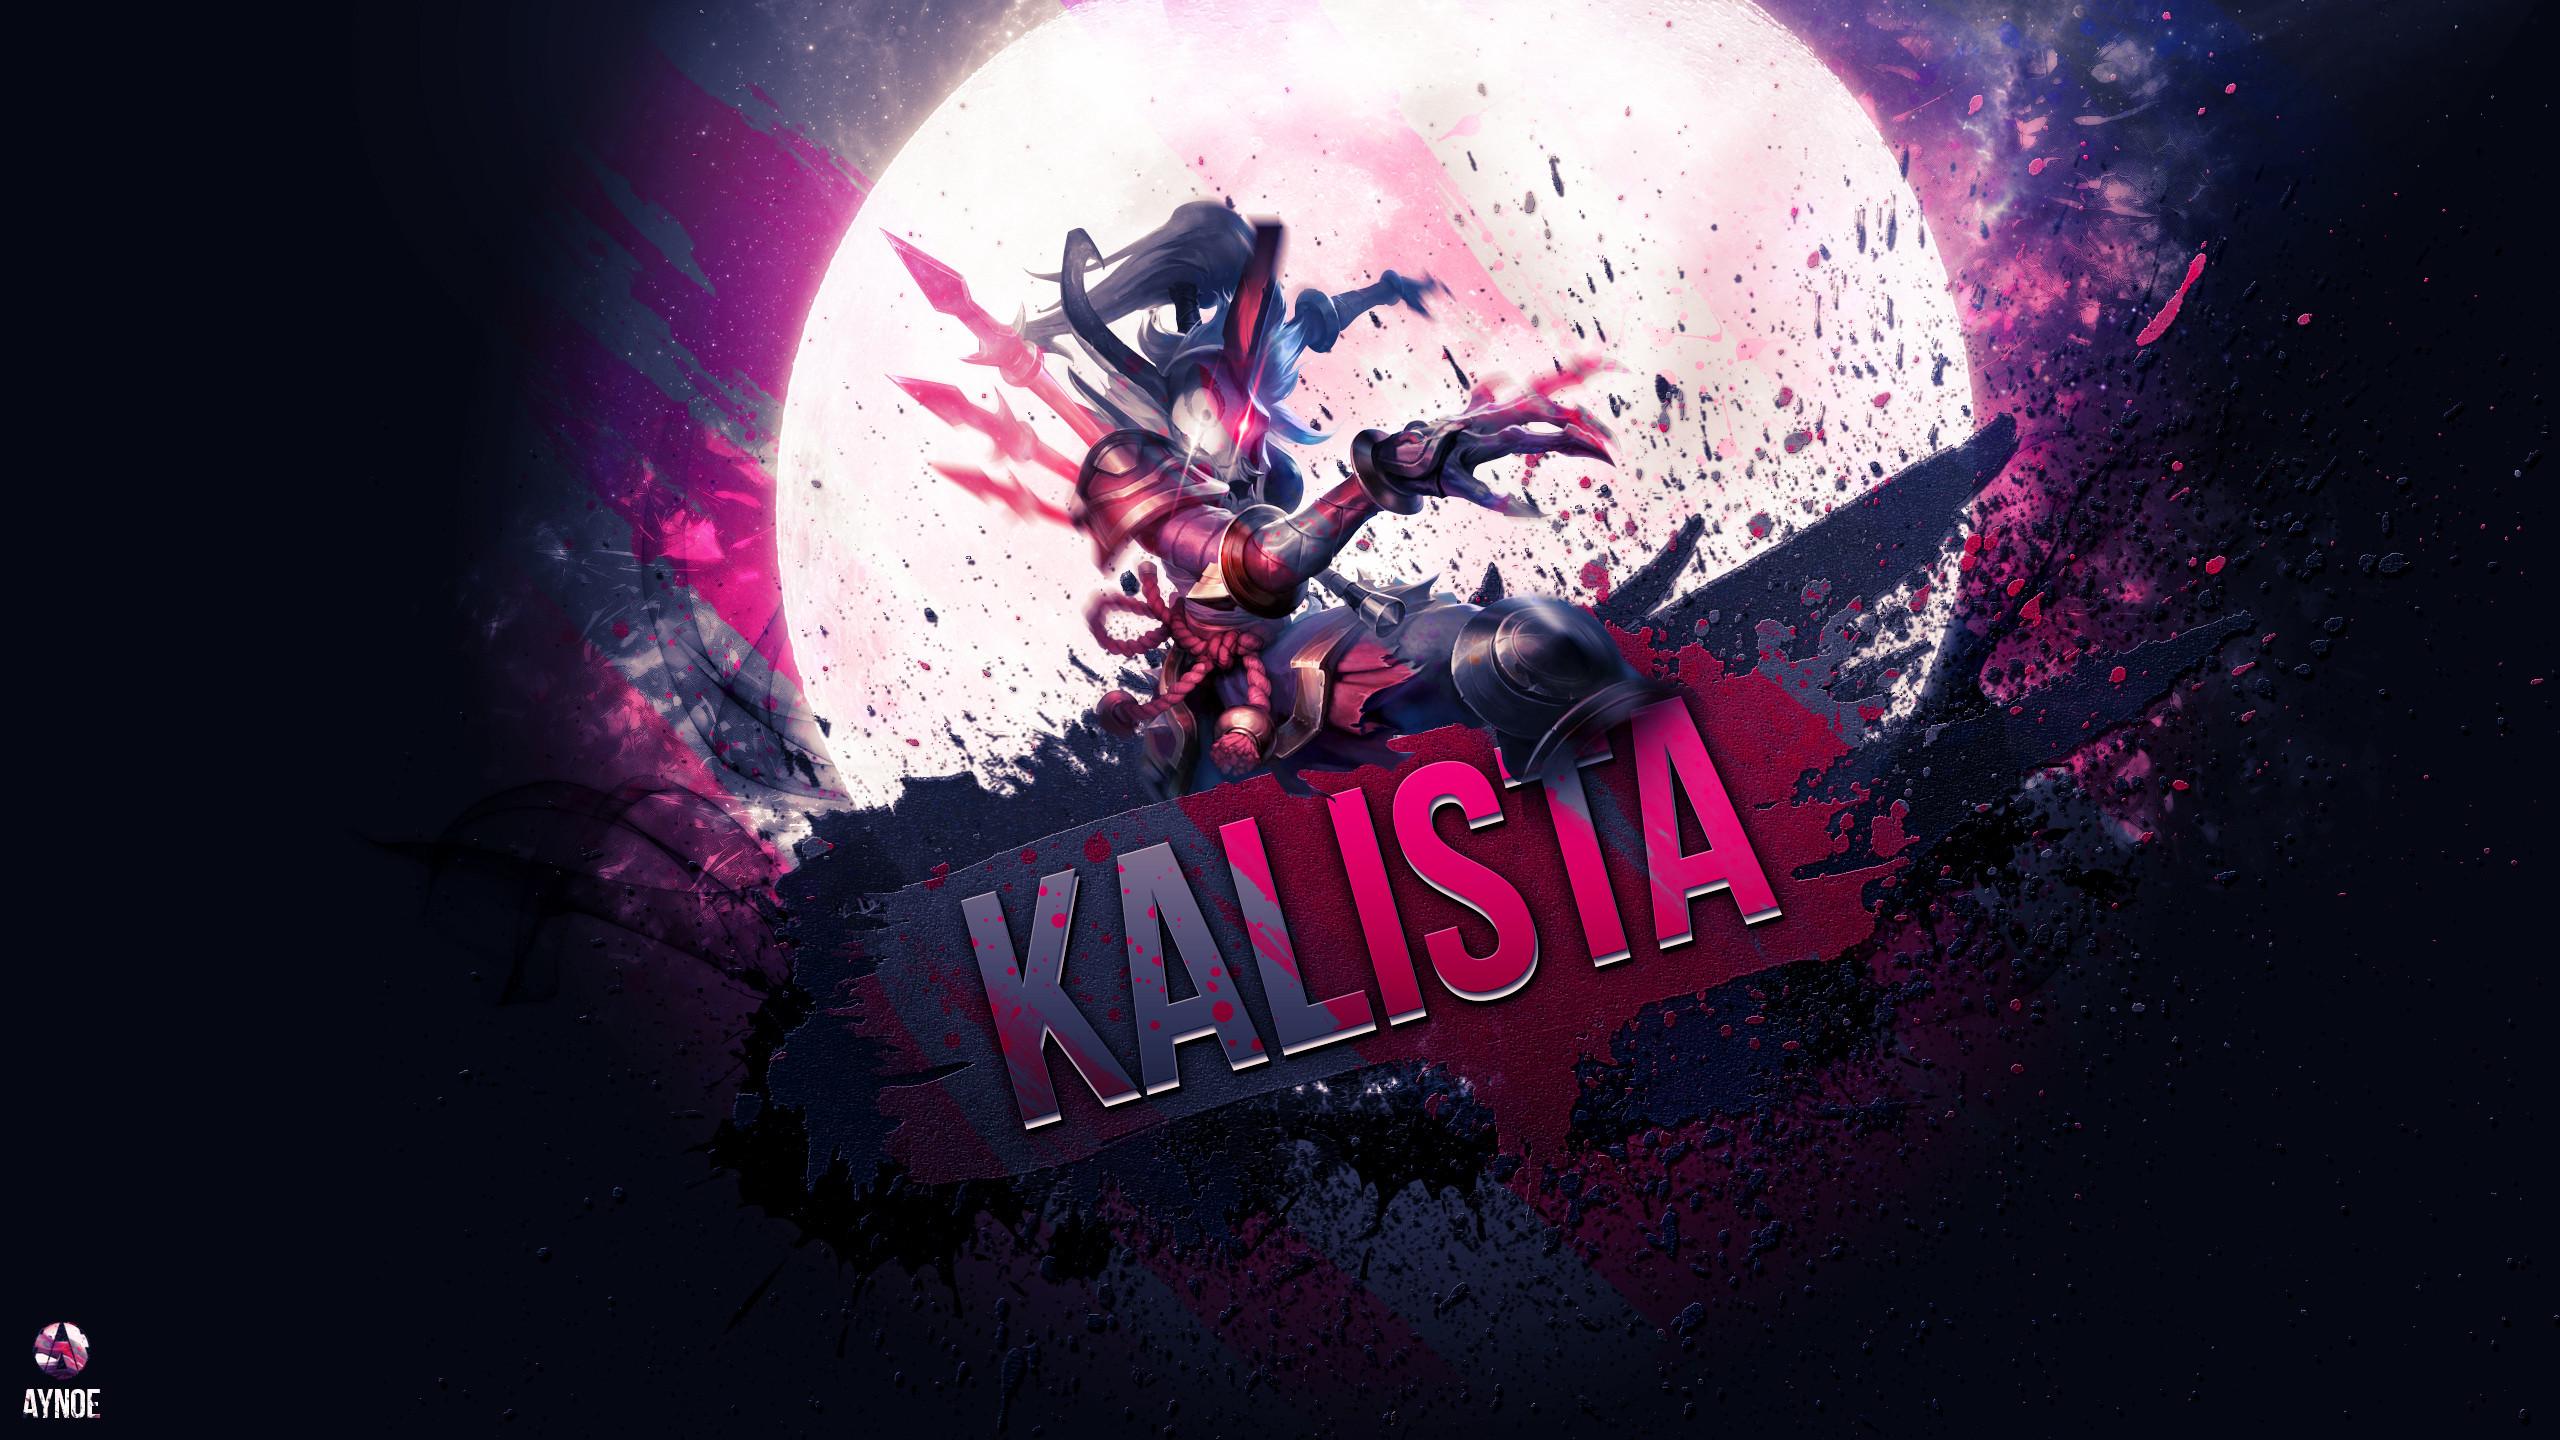 Kalista Wallpapers Wallpapertag